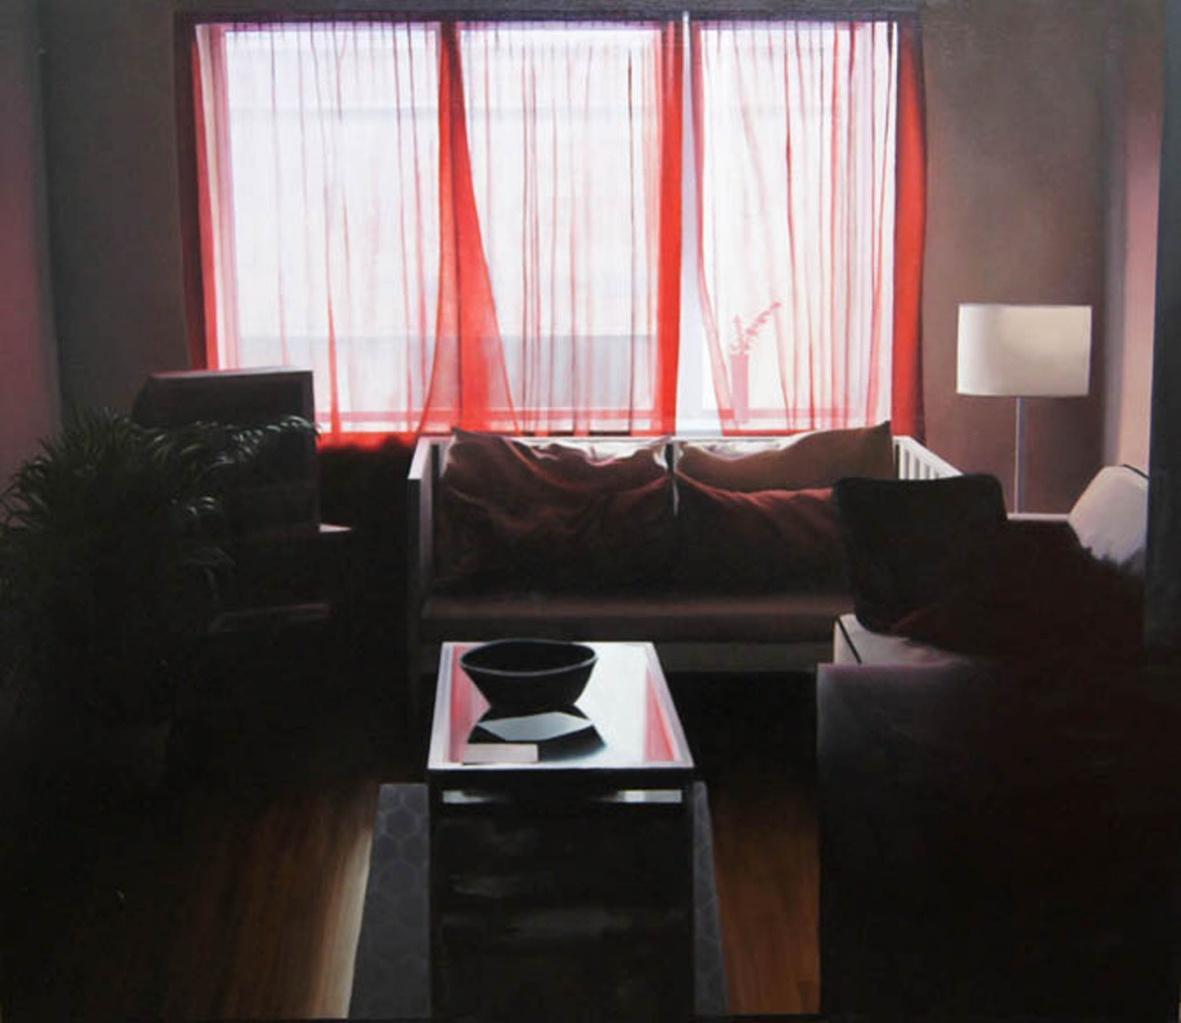 904 Bedford, realist interior geometric oil painting, 2010